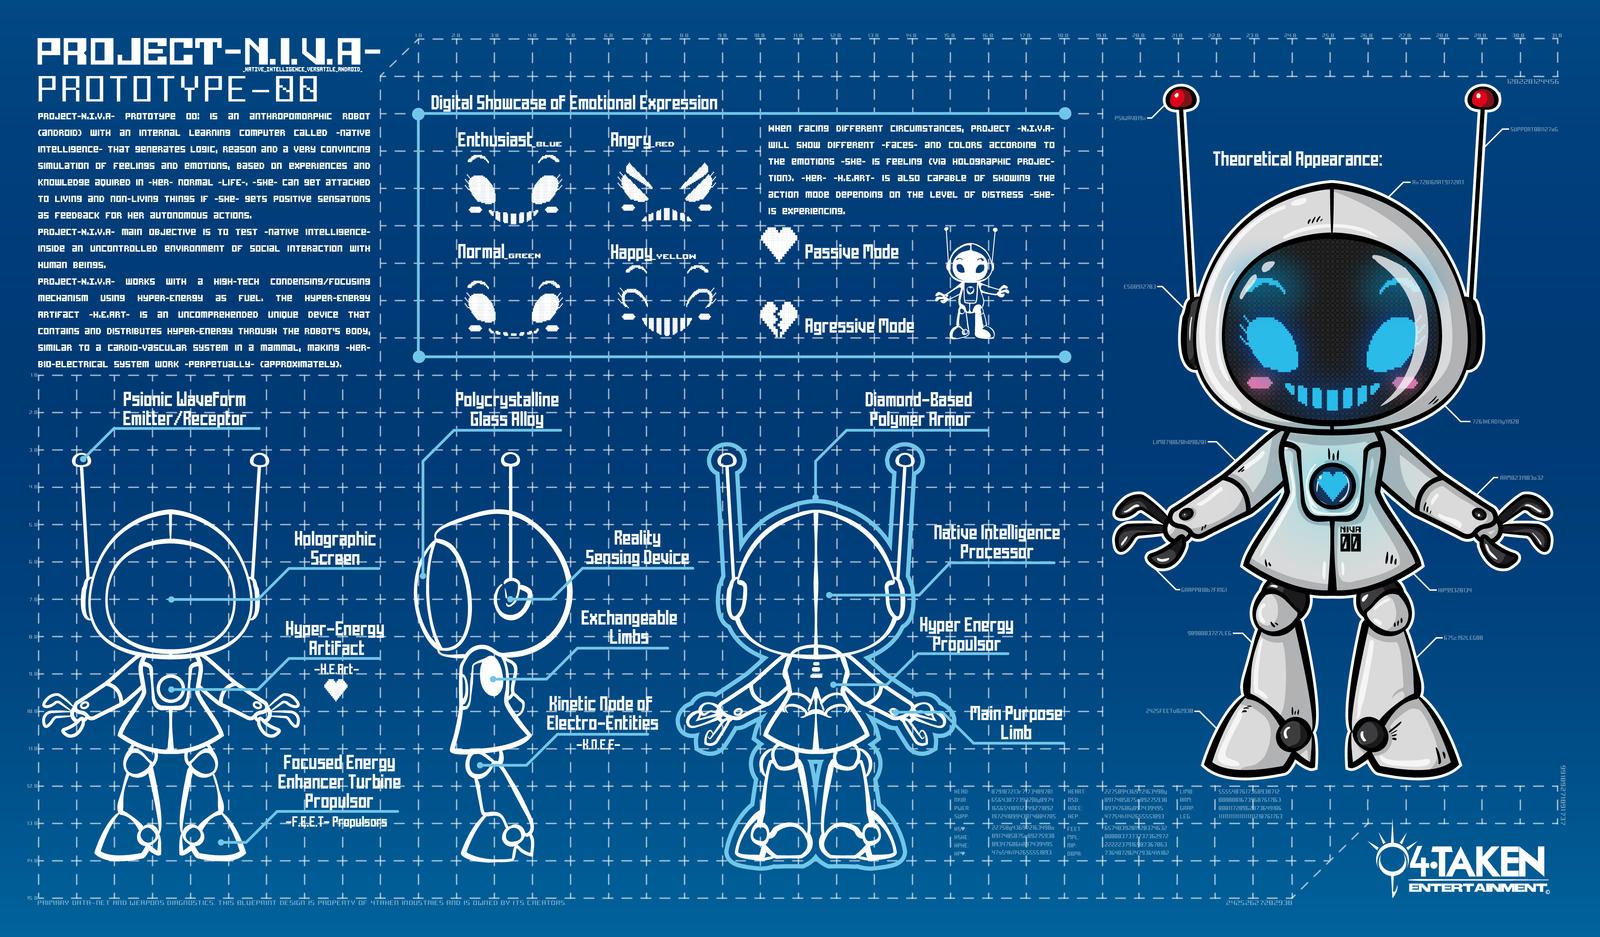 4TAKEN - Project-N.I.V.A- Prototype-00